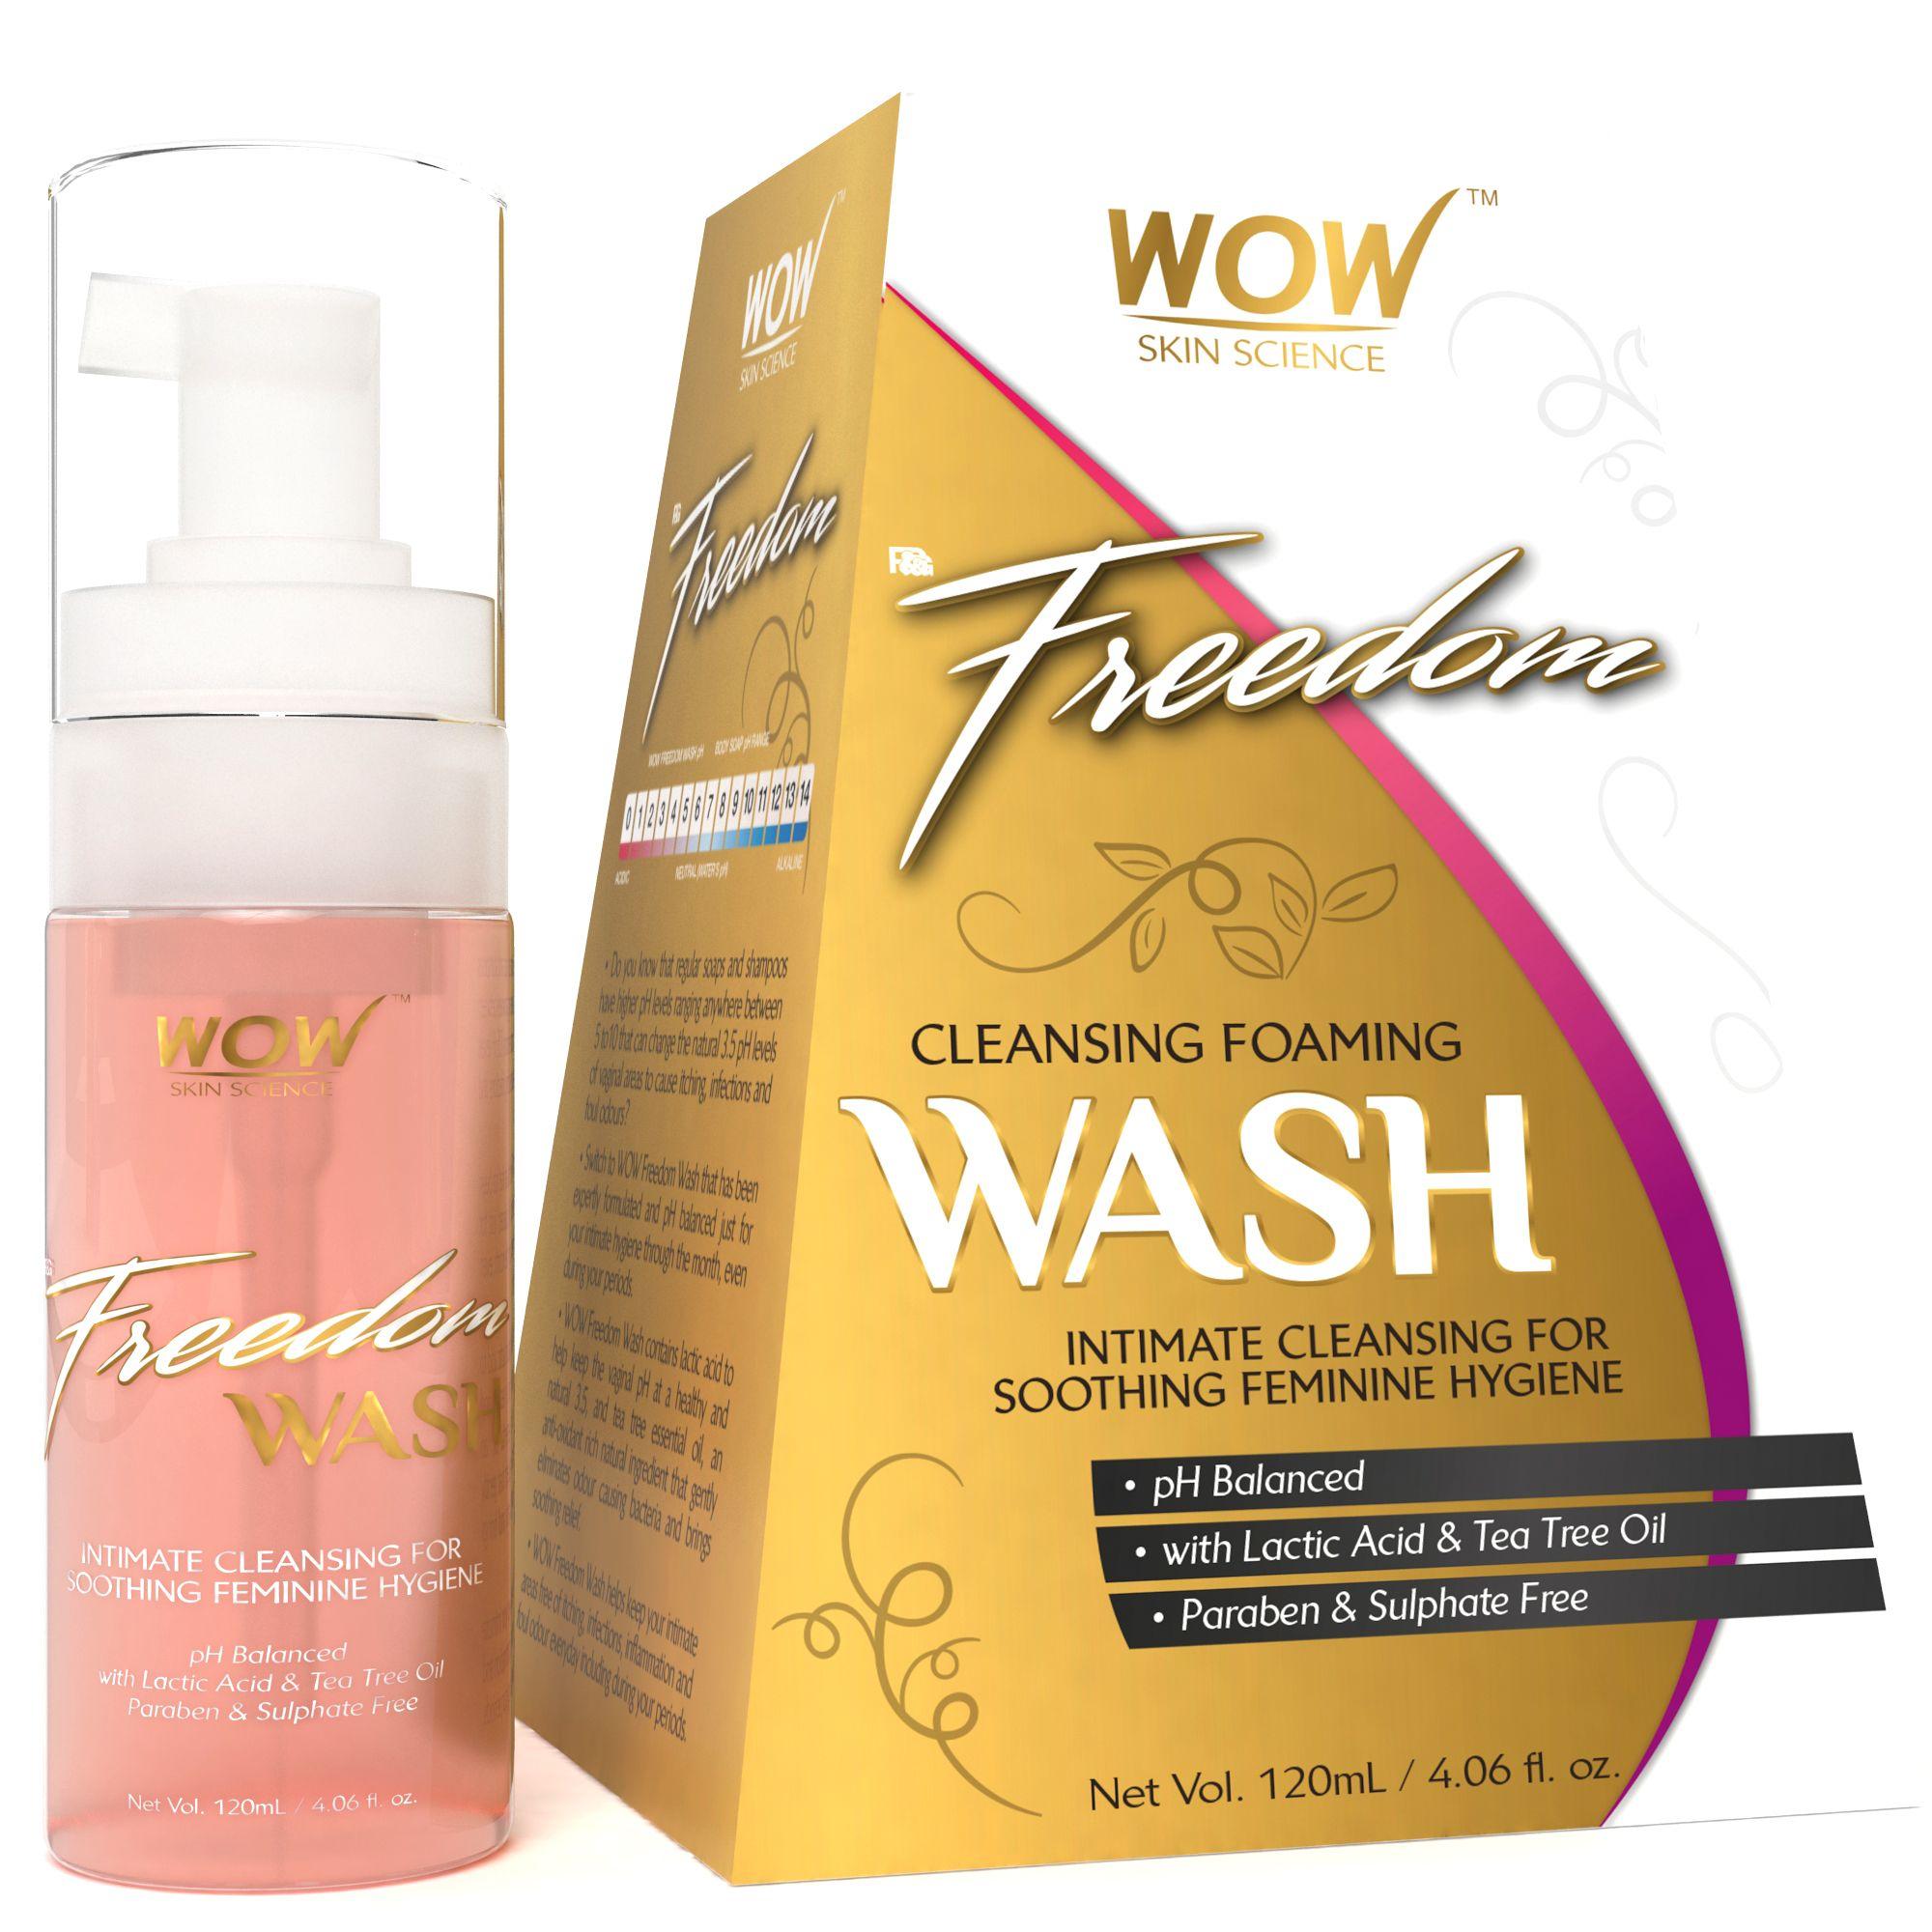 WOW Skin Science F&G Freedom Cleansing Foam Wash Intimate Cleansing Foam 120 ml